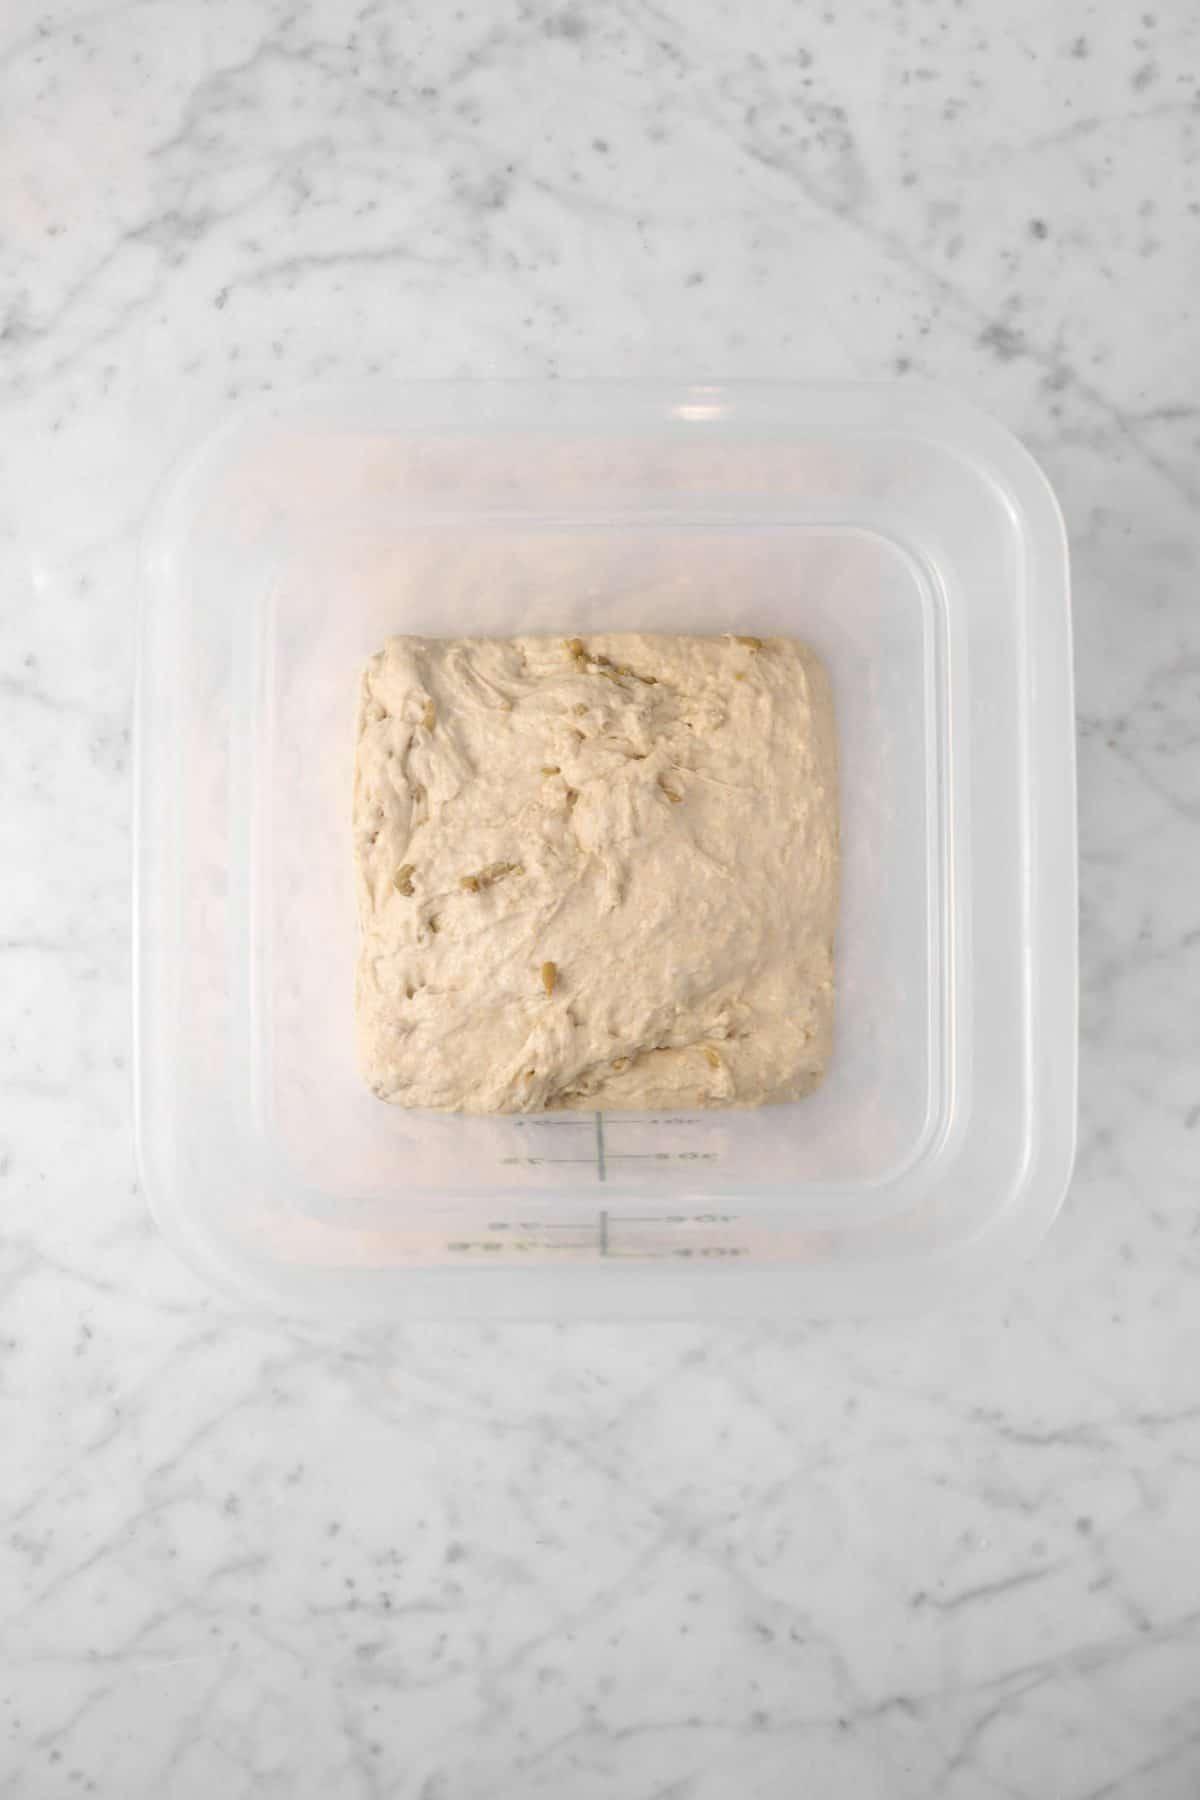 sourdough in a plastic container